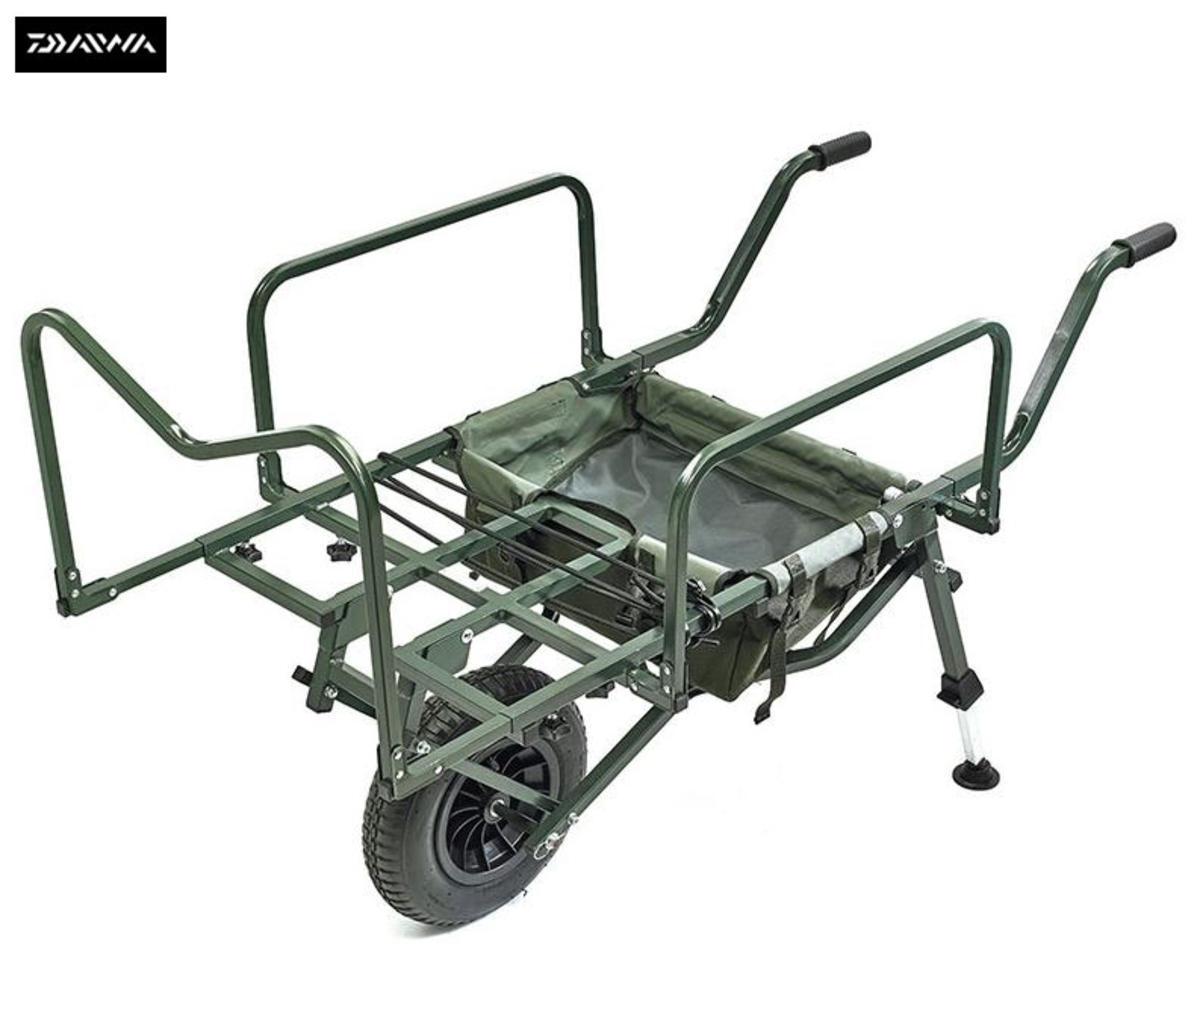 Special Clearance Offer Daiwa Infinity Freeloader Wheelbarrow - IFLWB